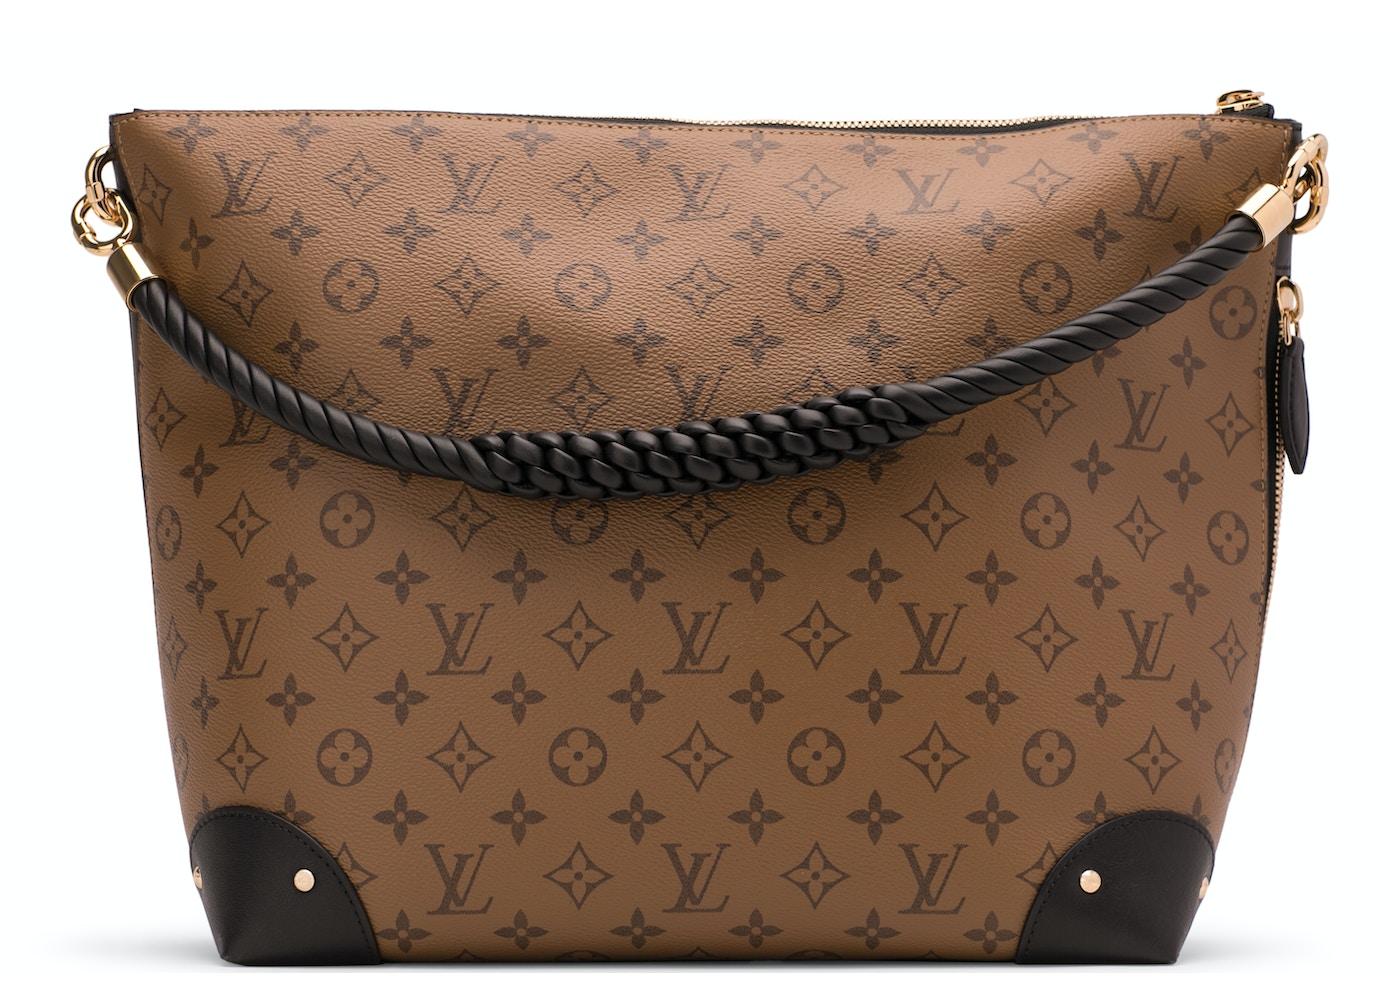 96401fd6158 Louis Vuitton Hobo Triangle Softy Monogram Reverse. Monogram Reverse